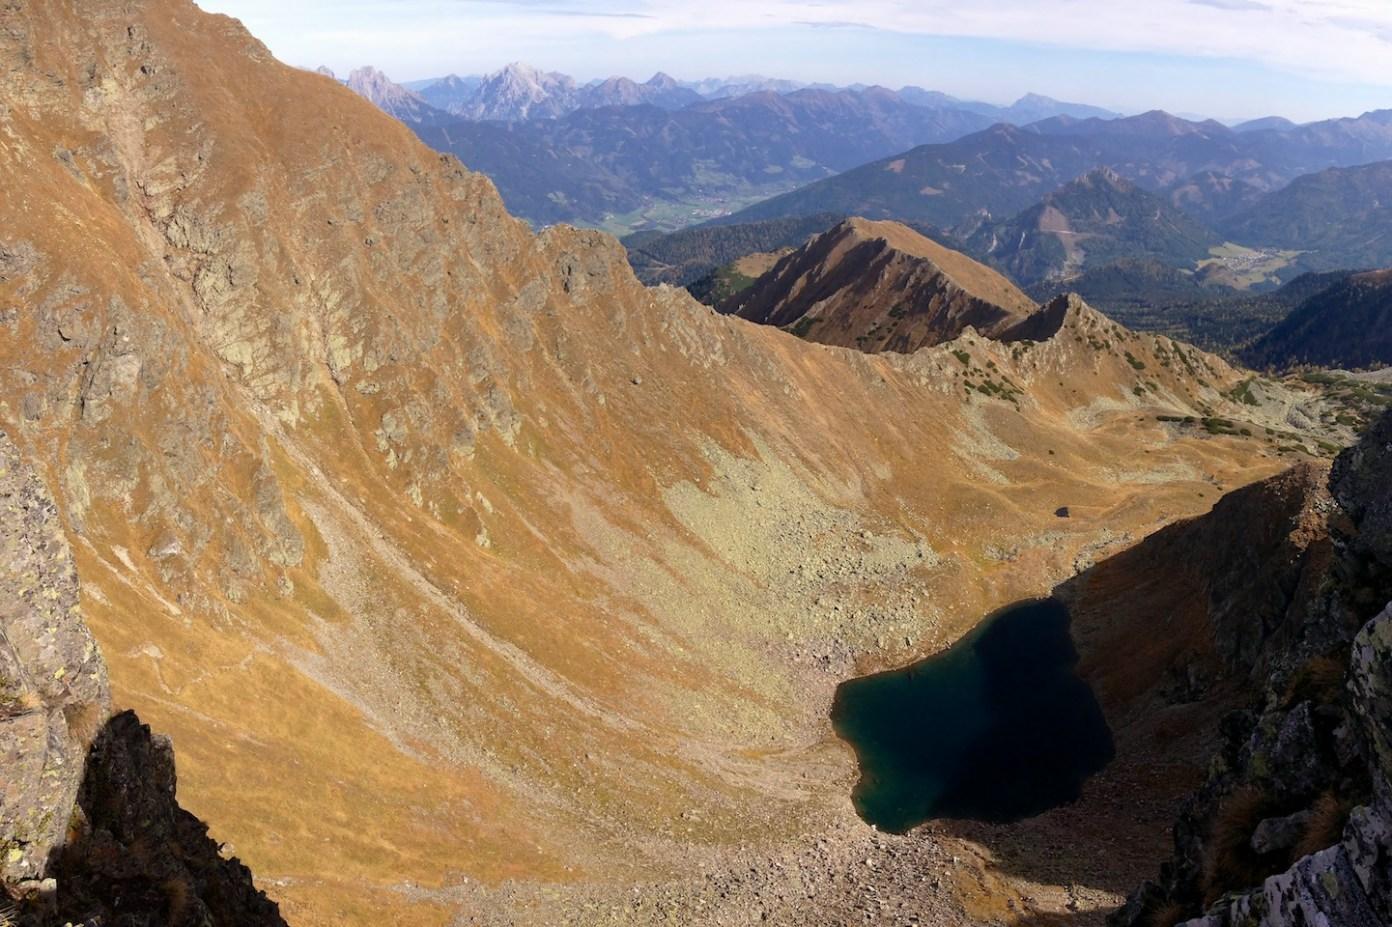 Vysoko nad jezerem Gefrorener See